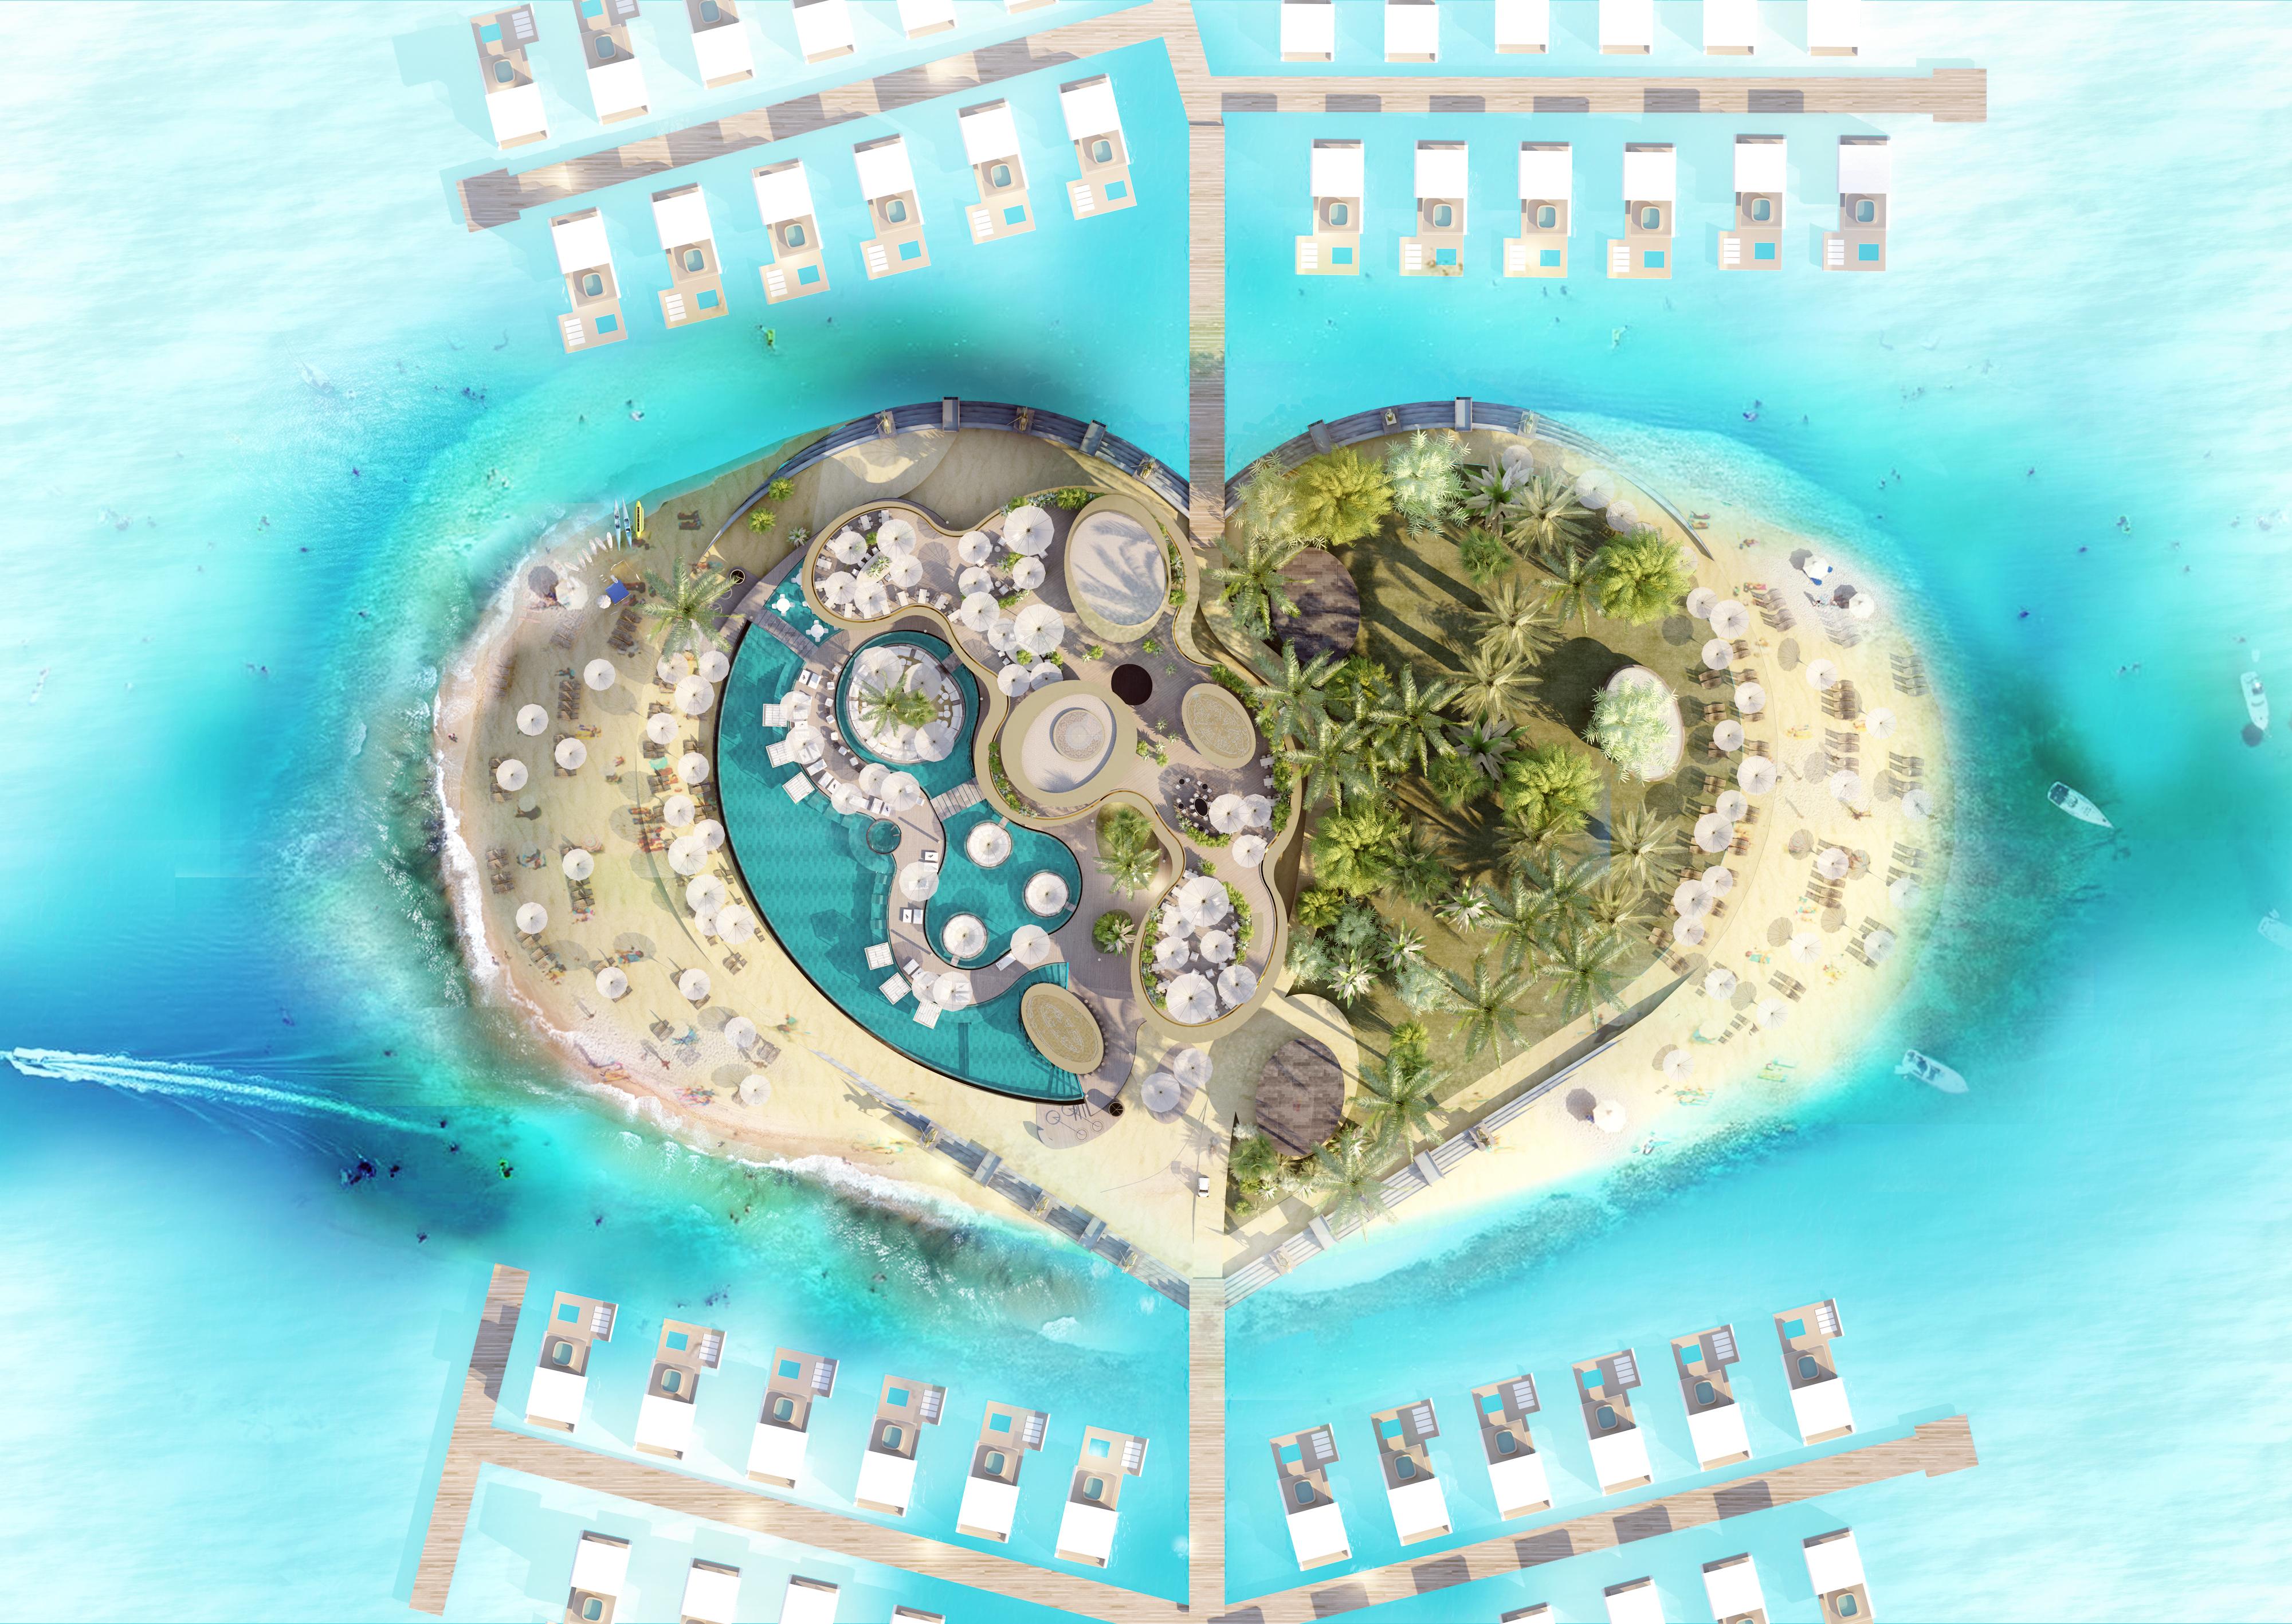 Heart of Europe, $5 billion Dubai megaresort, rises from The World